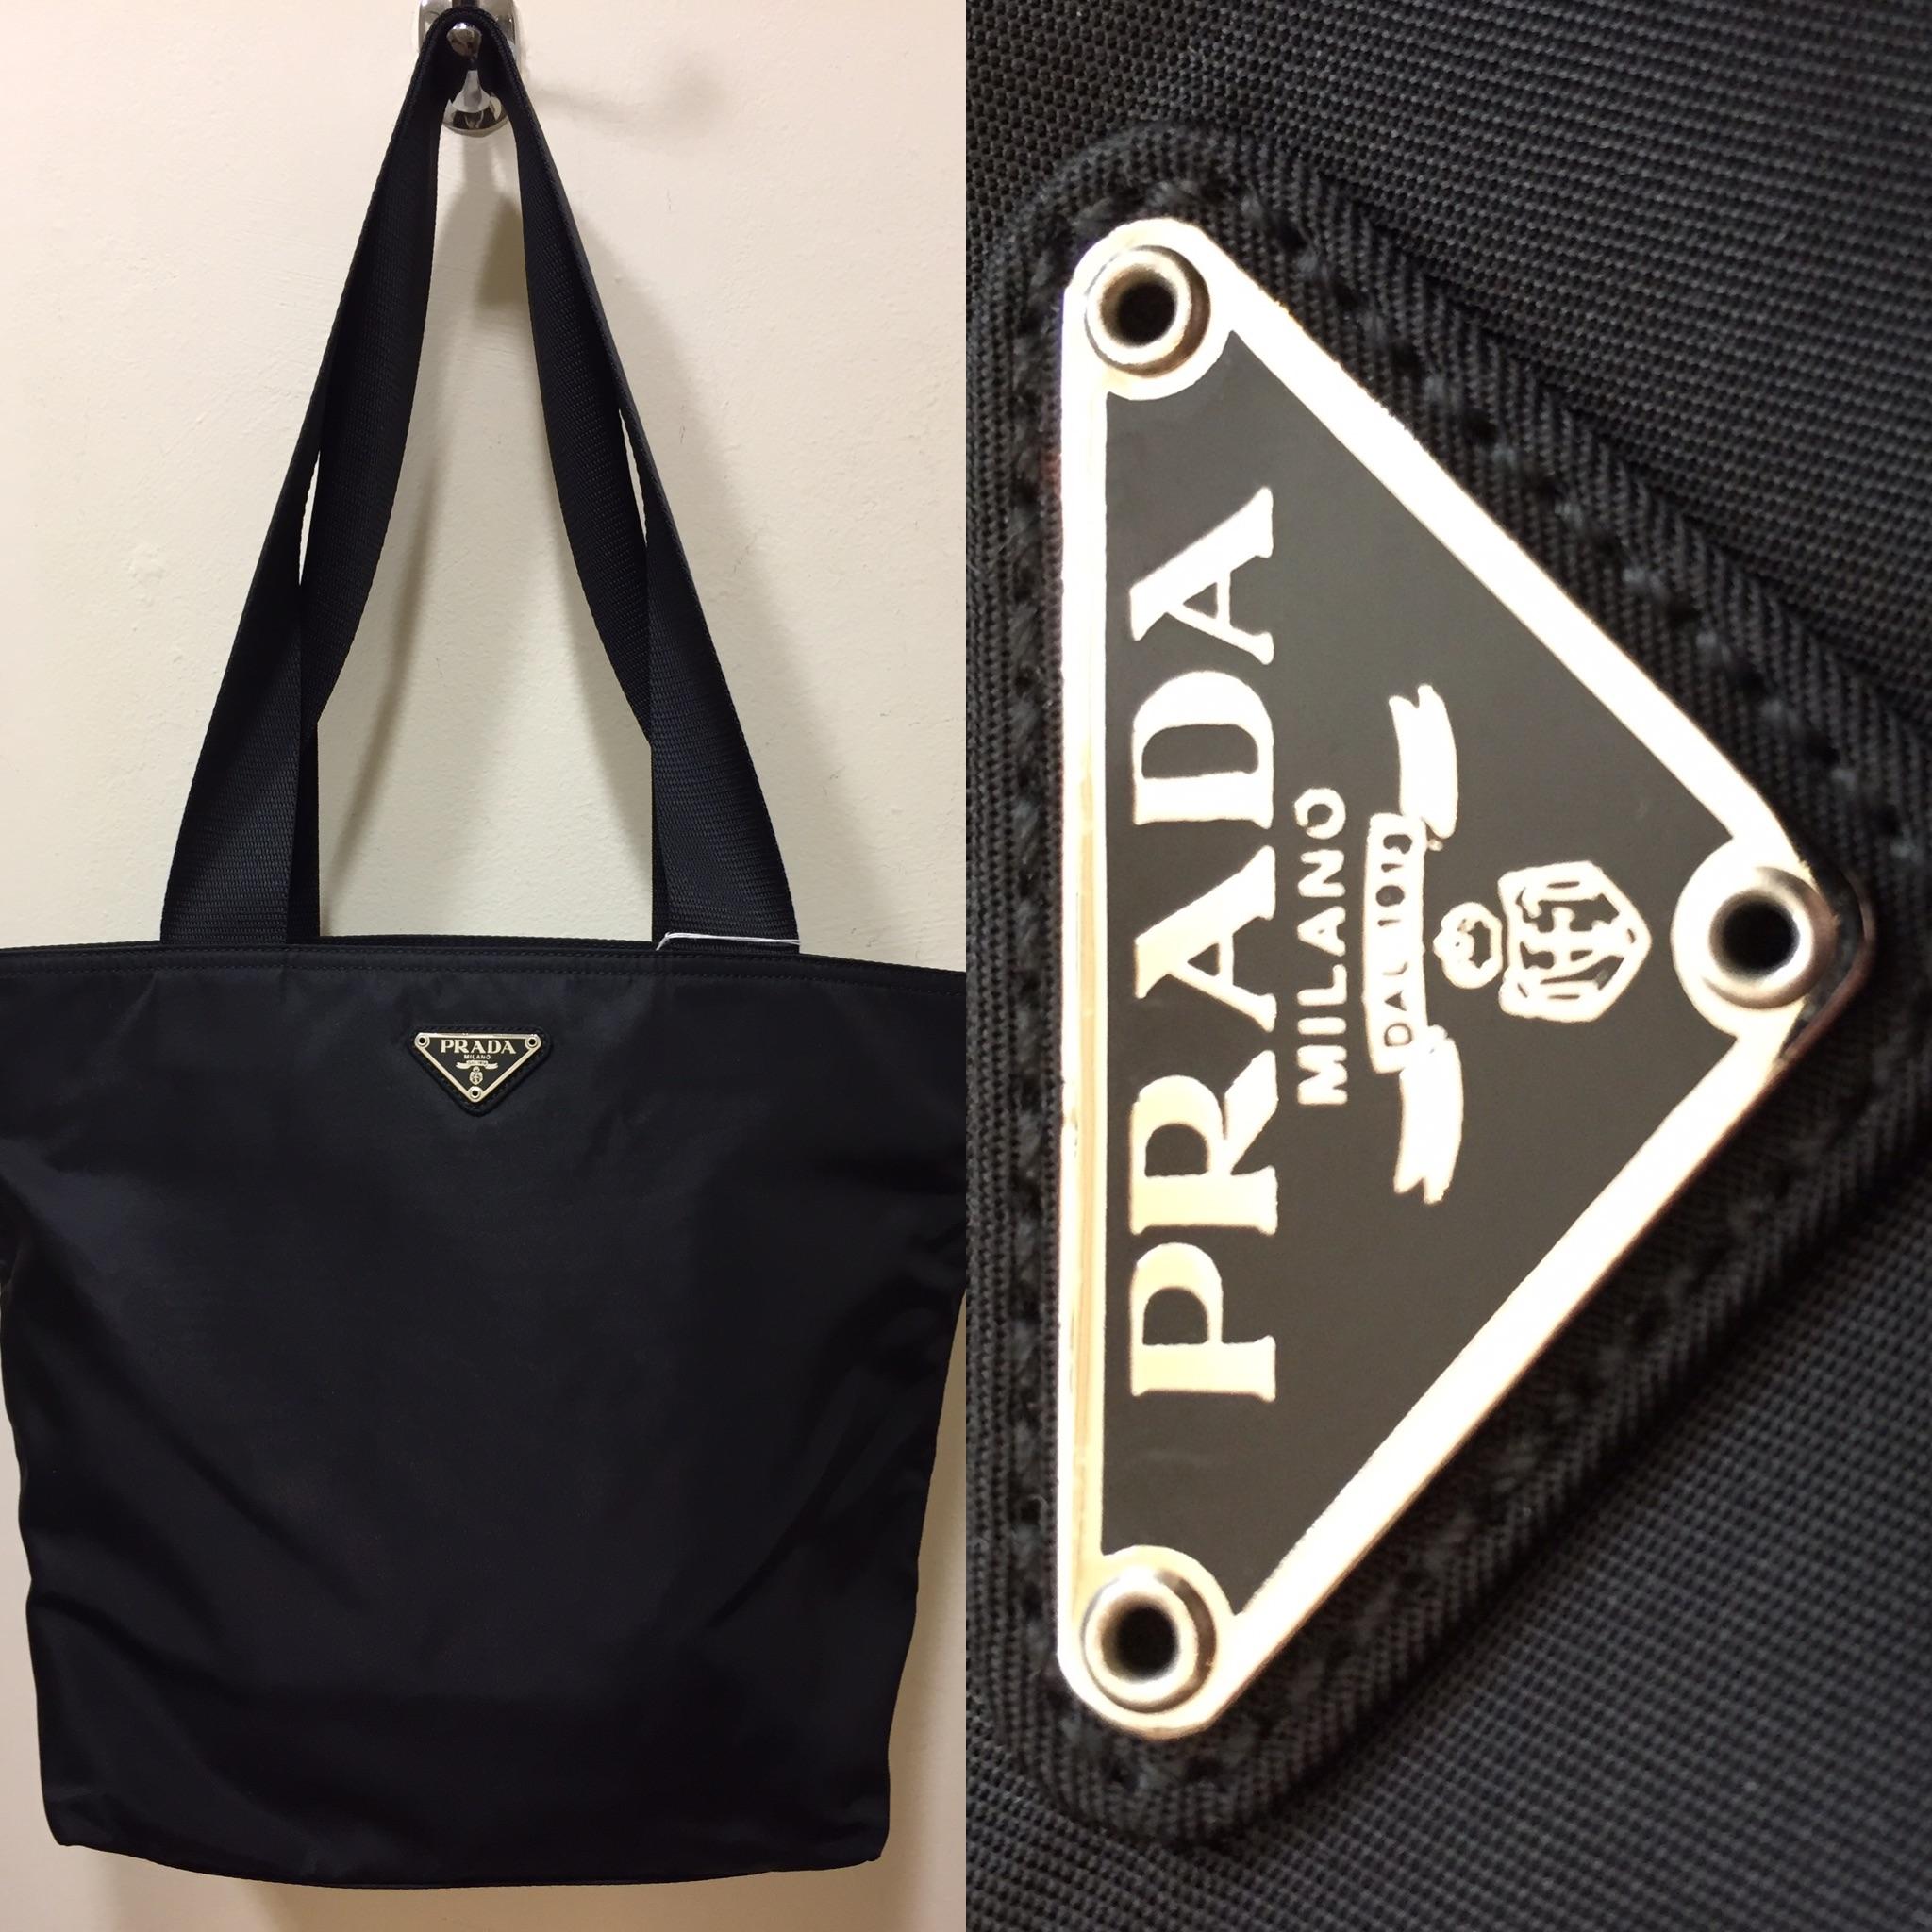 Black fabric Prada bag £199.jpg